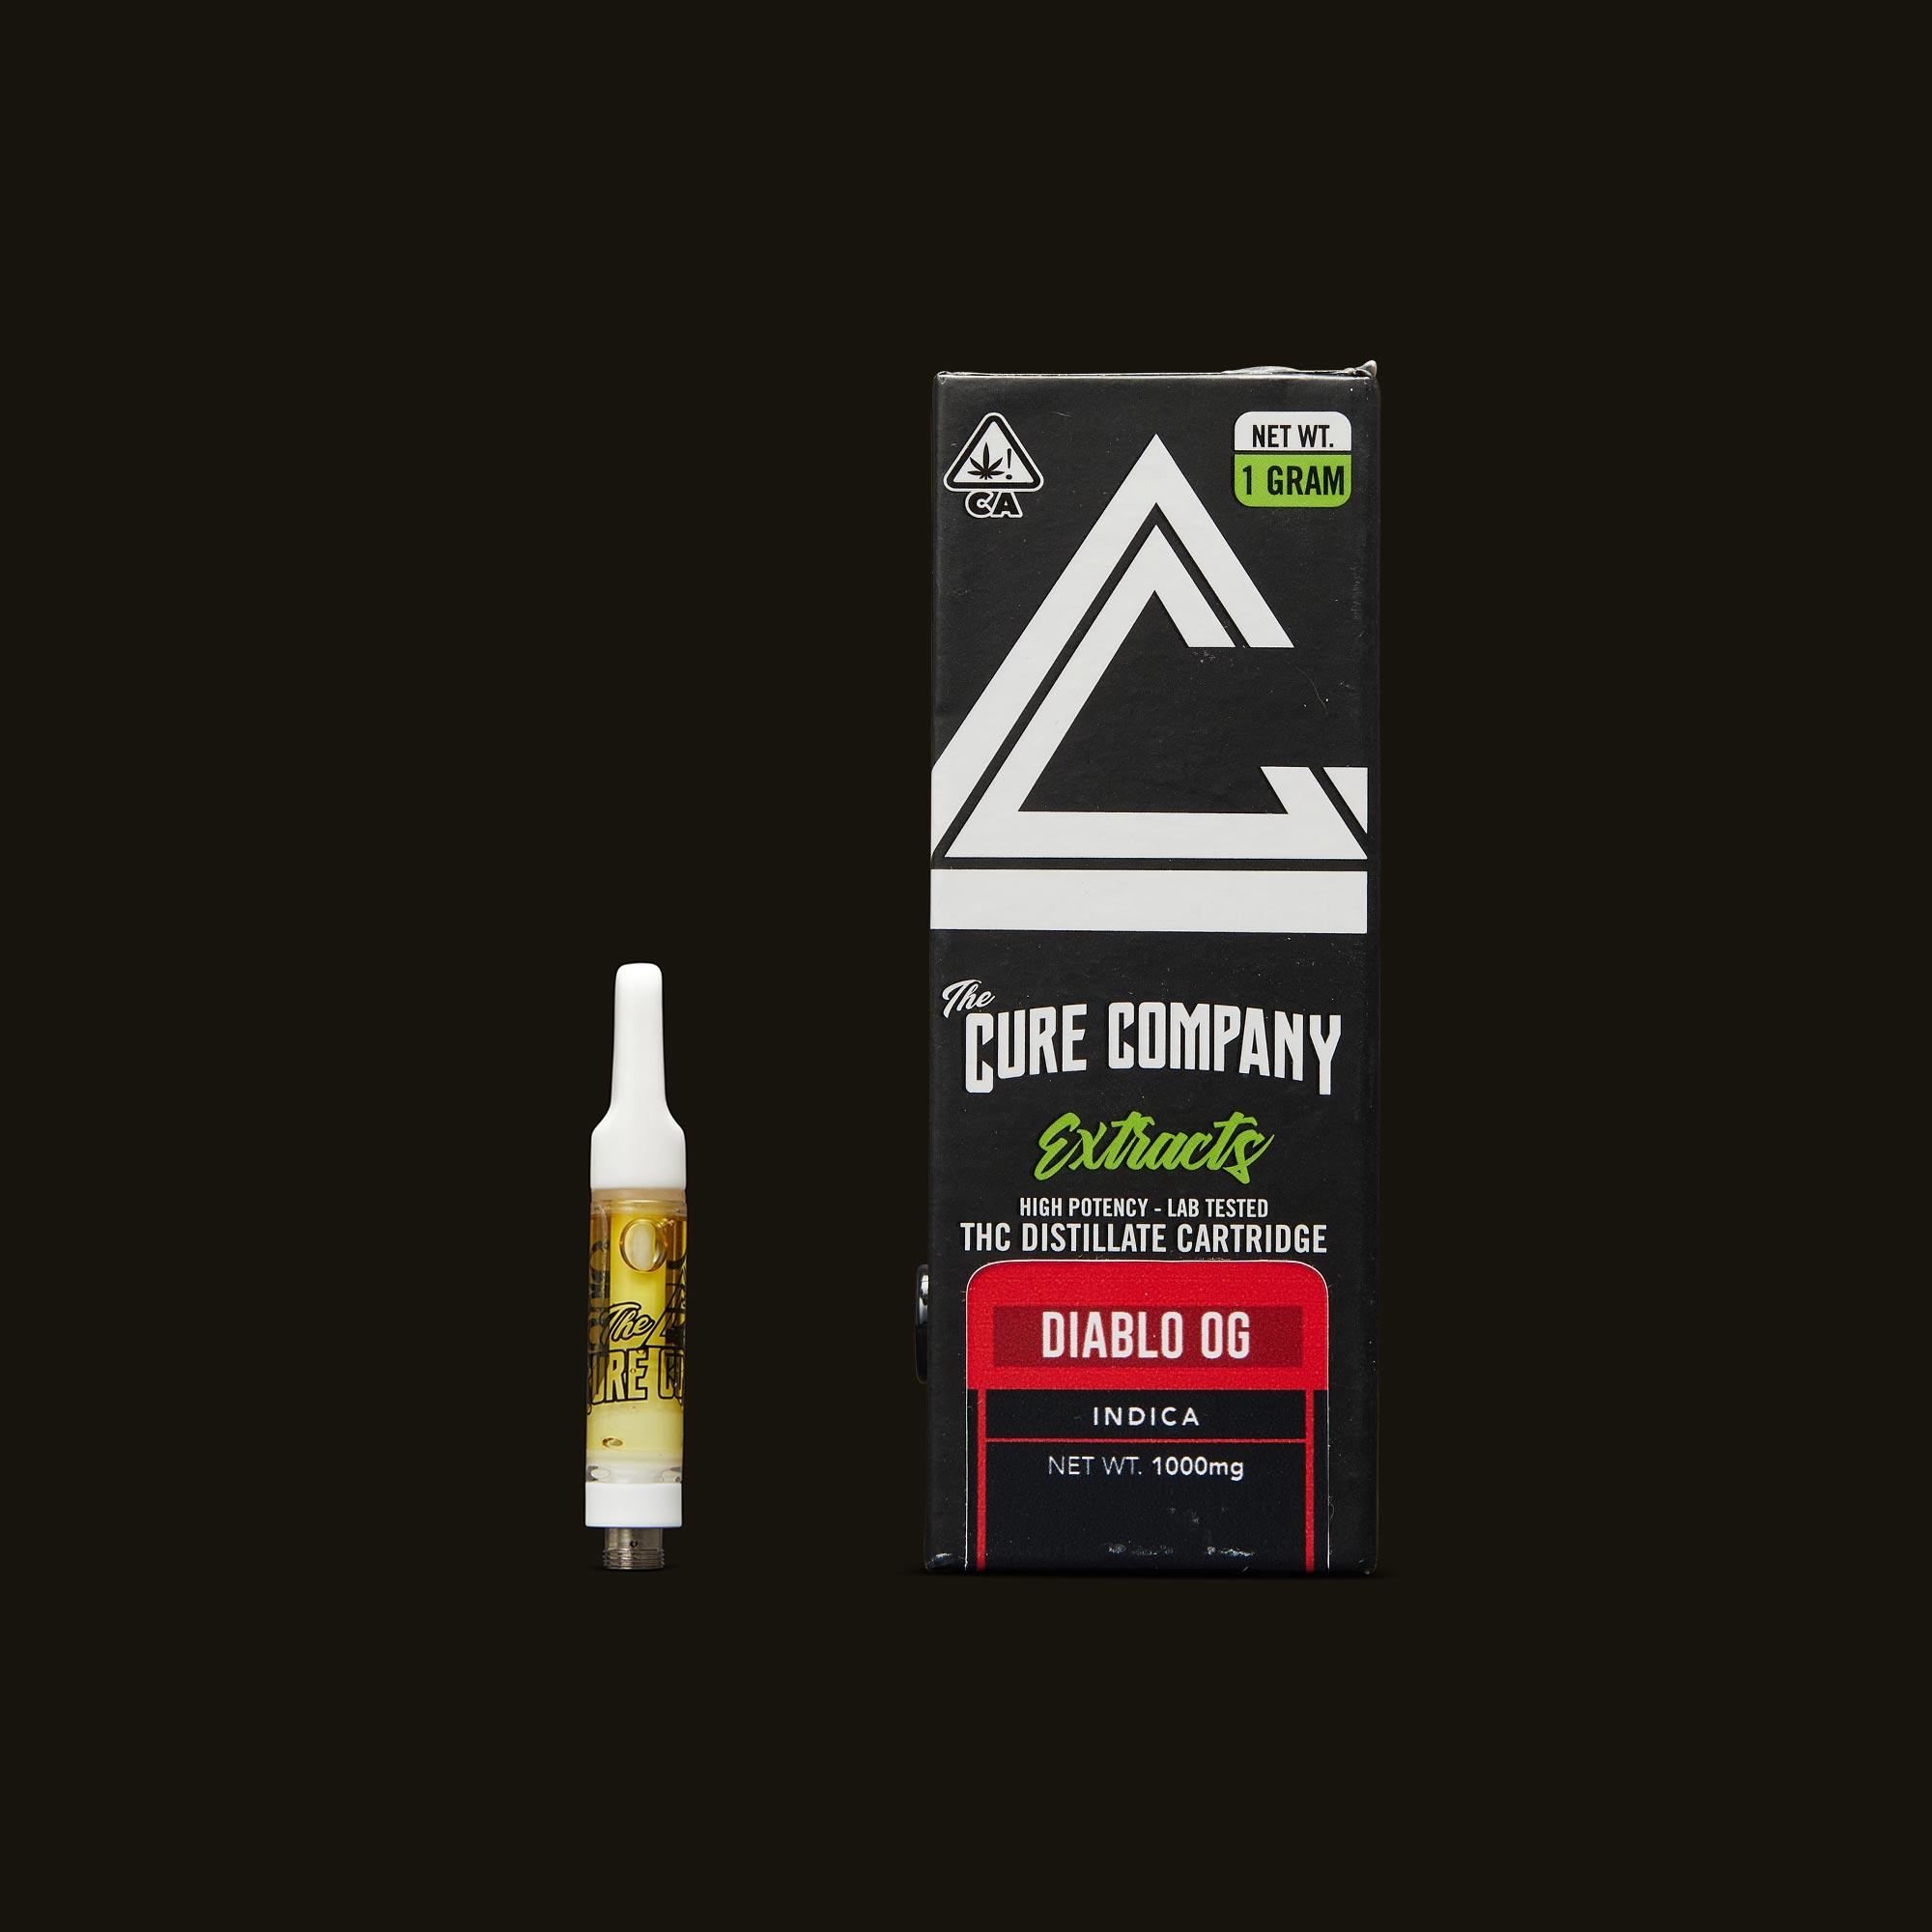 The Cure Company Diablo OG Cartridge